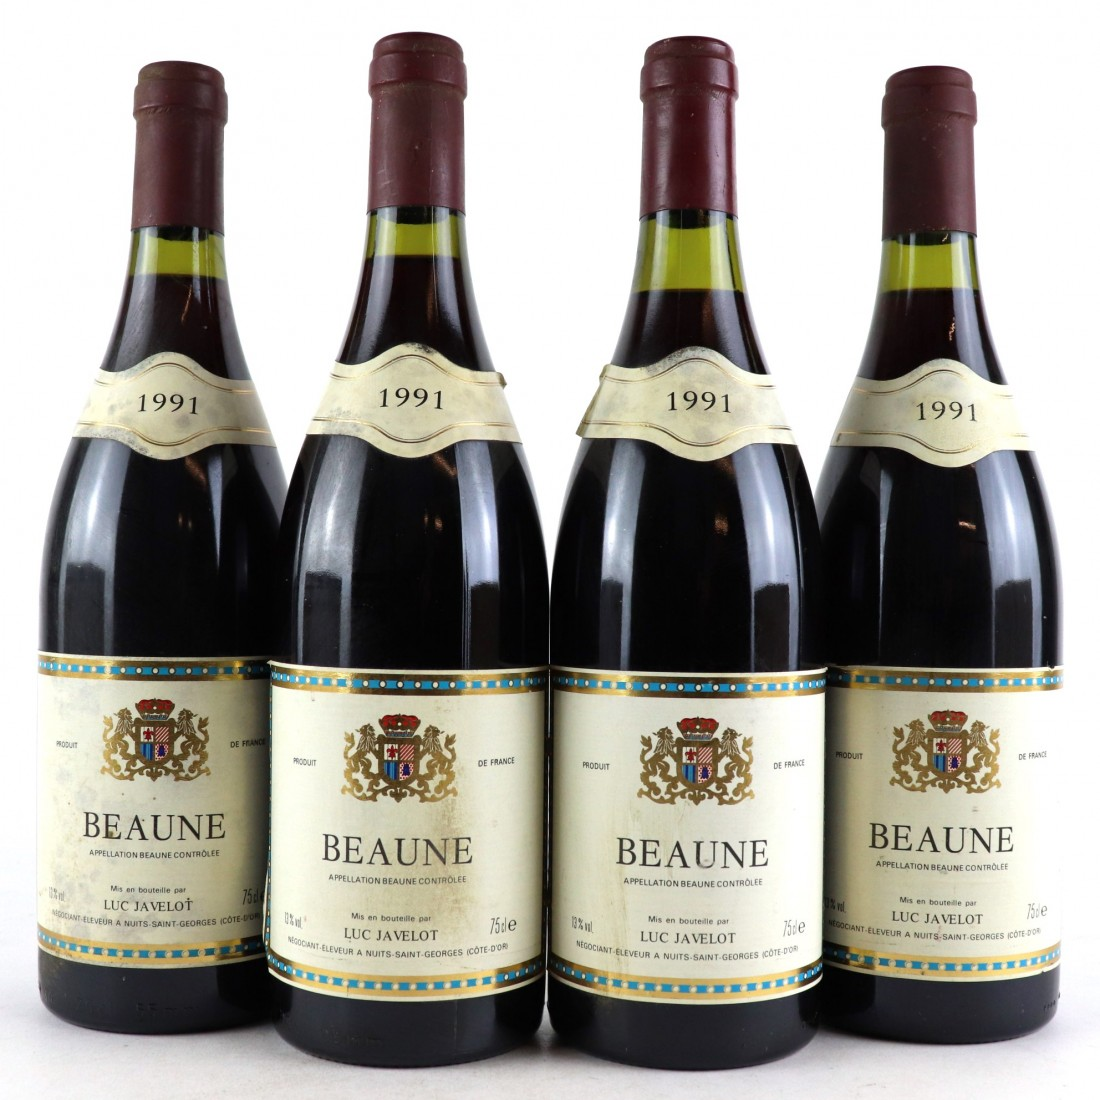 L.Javelot 1991 Beaune 4x75cl